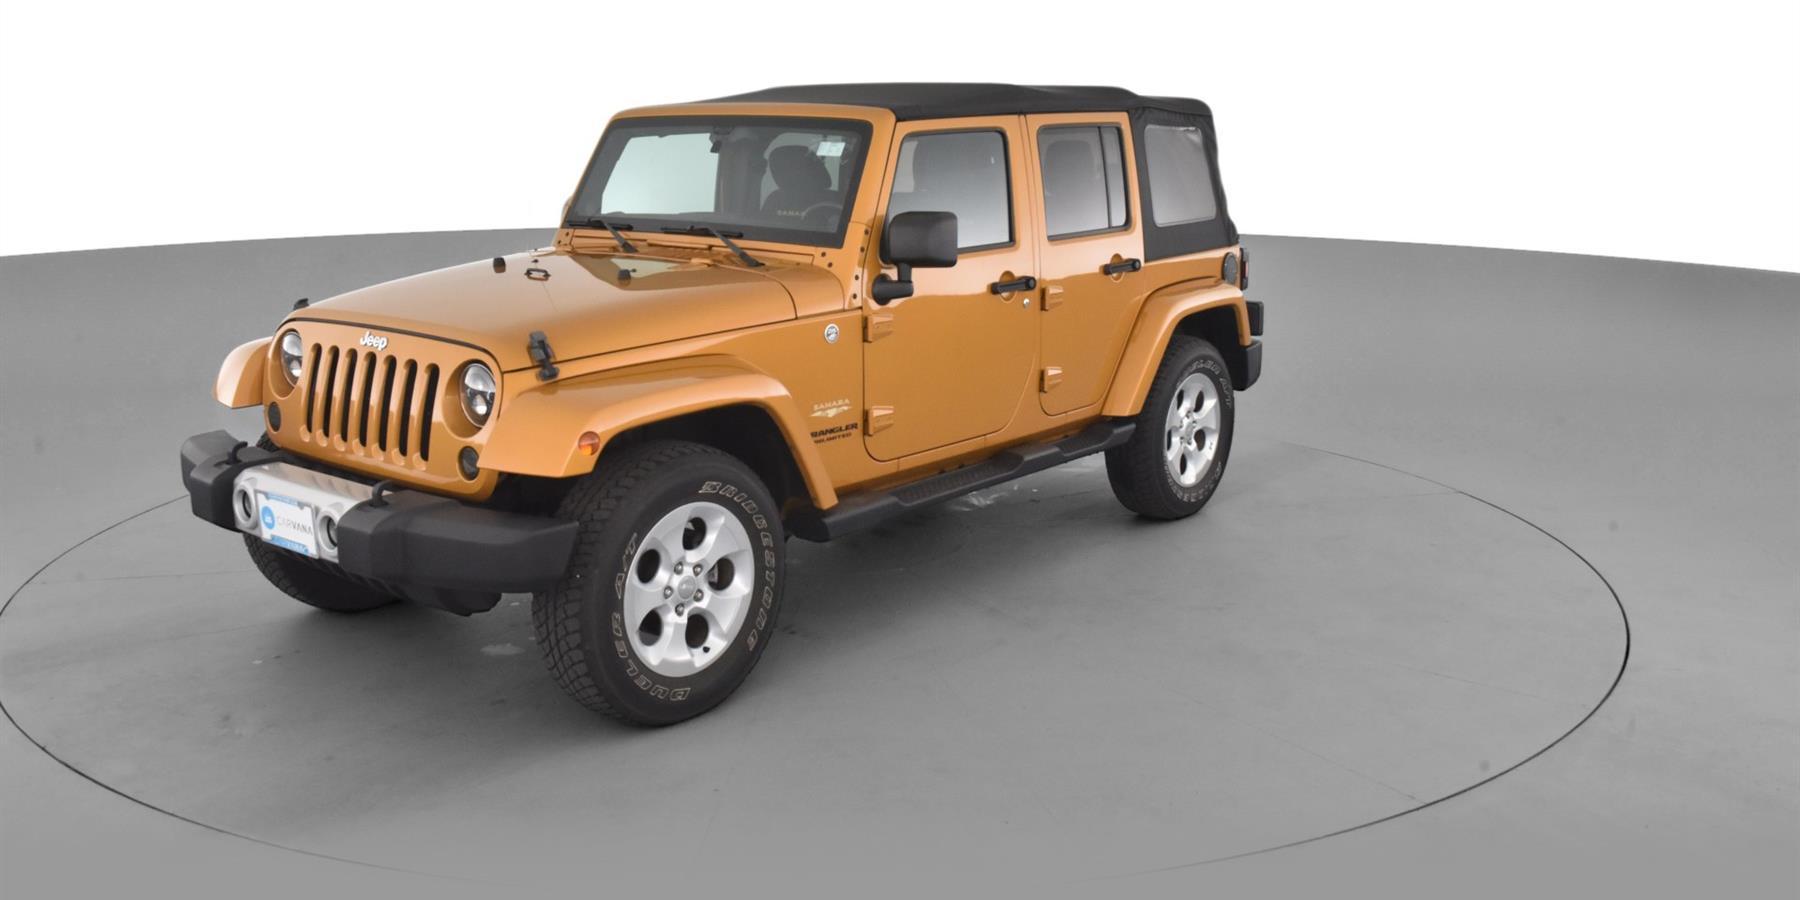 2014 Jeep Wrangler Unlimited Sahara Sport Utility 4d For Sale Carvana